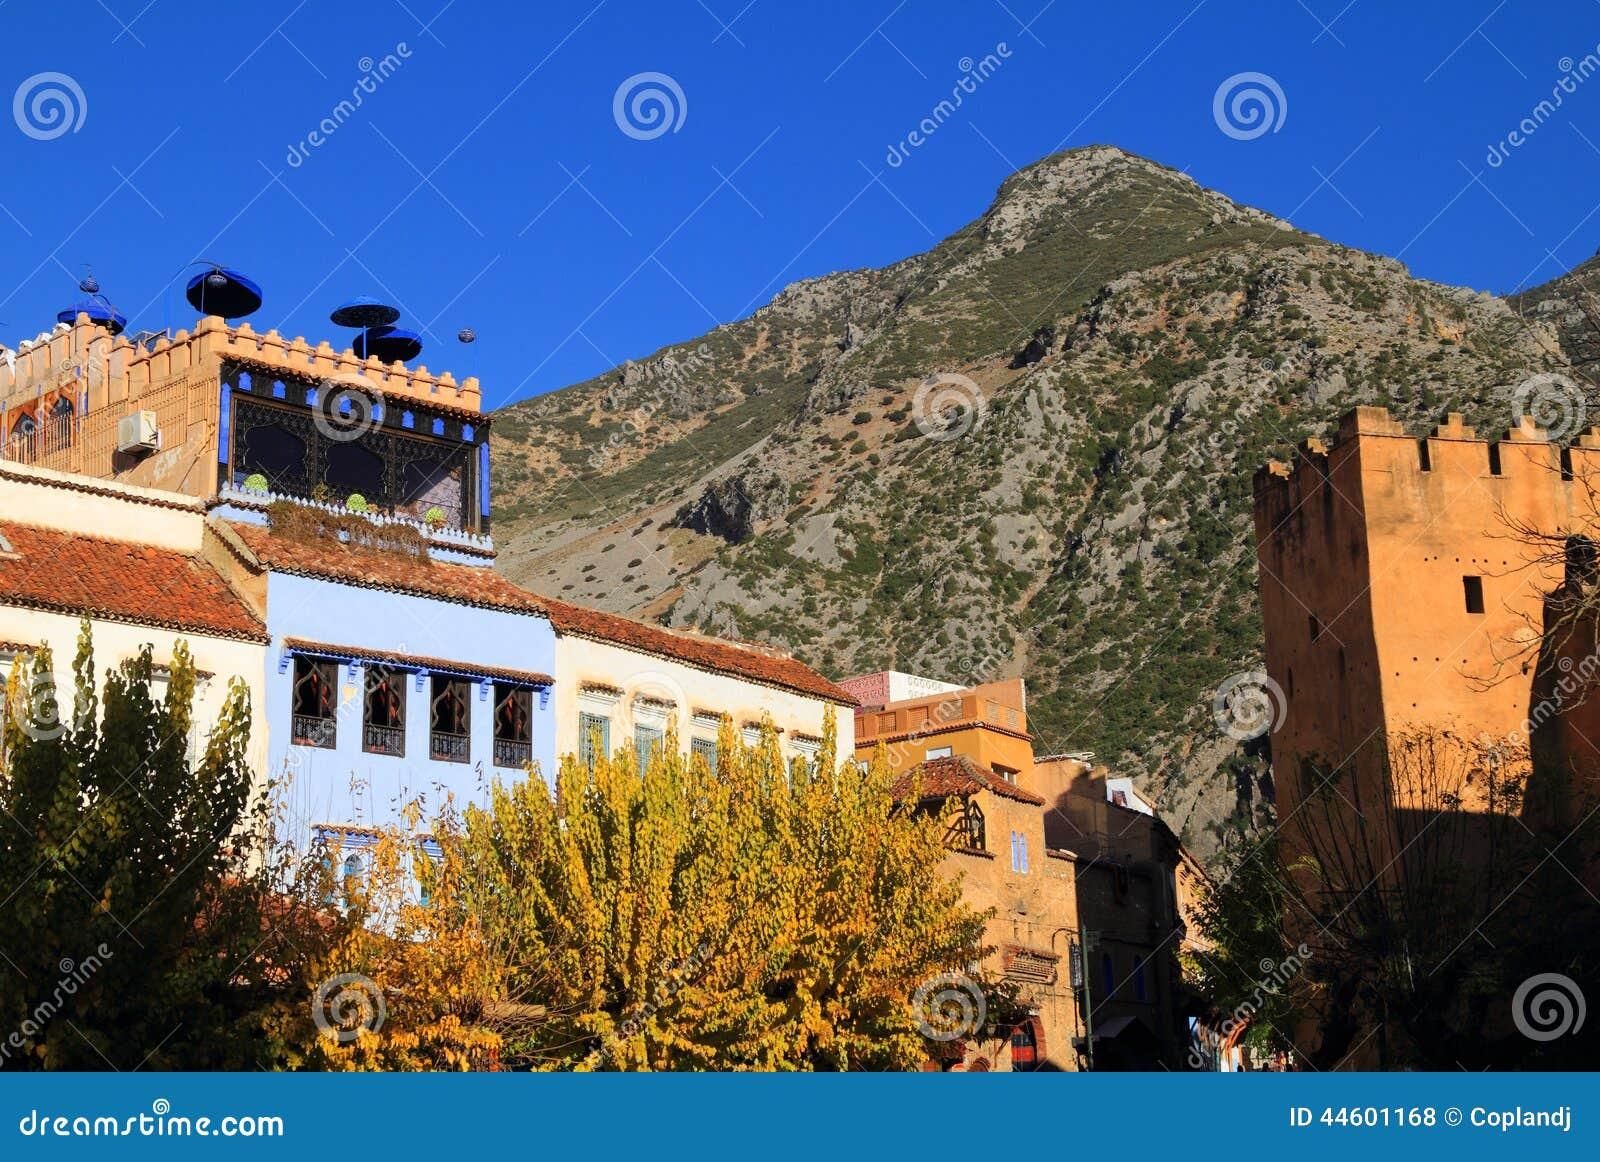 Kasbah de Chefchaouen, Maroc